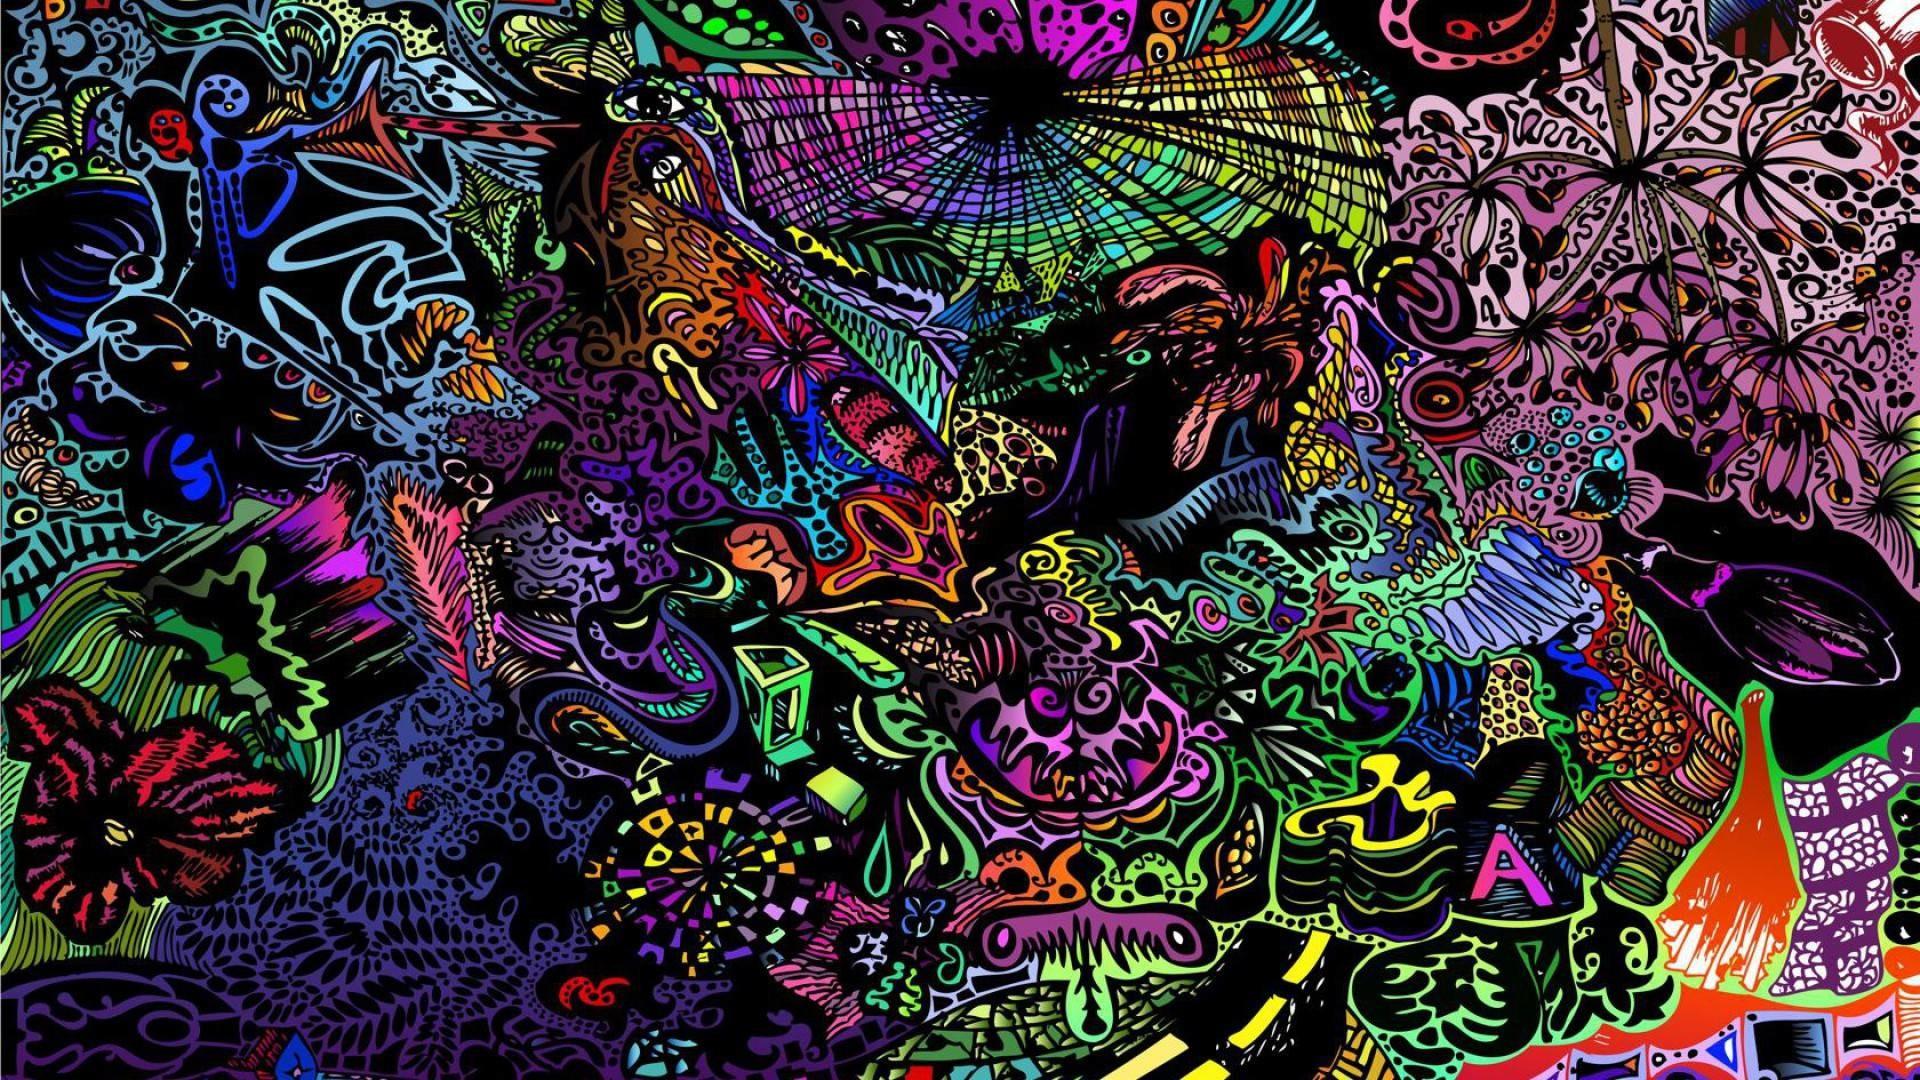 1 Miscellaneous Digital Art Trippy Colorful Wallpaper – WallpaperTube